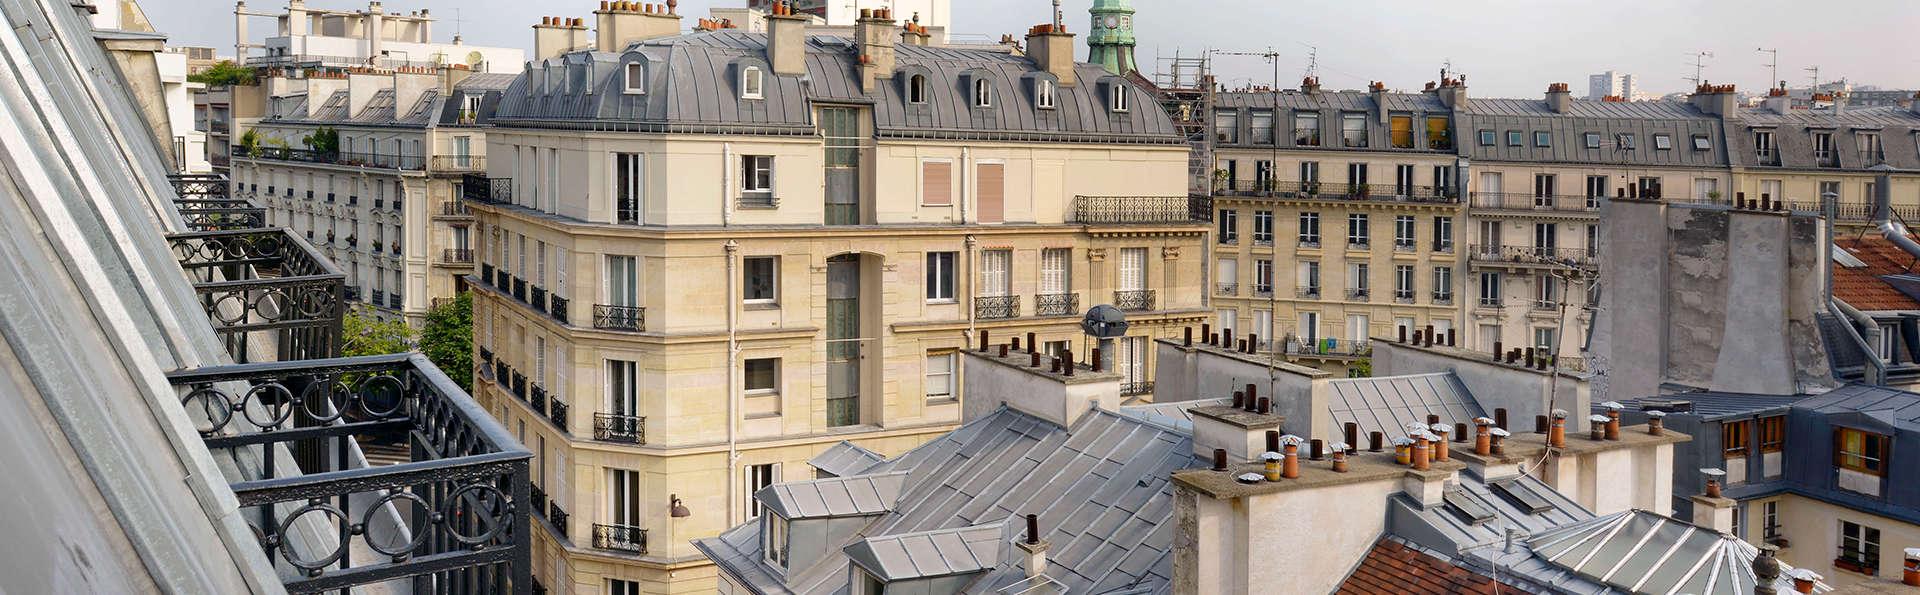 Le Mareuil - EDIT_view.jpg